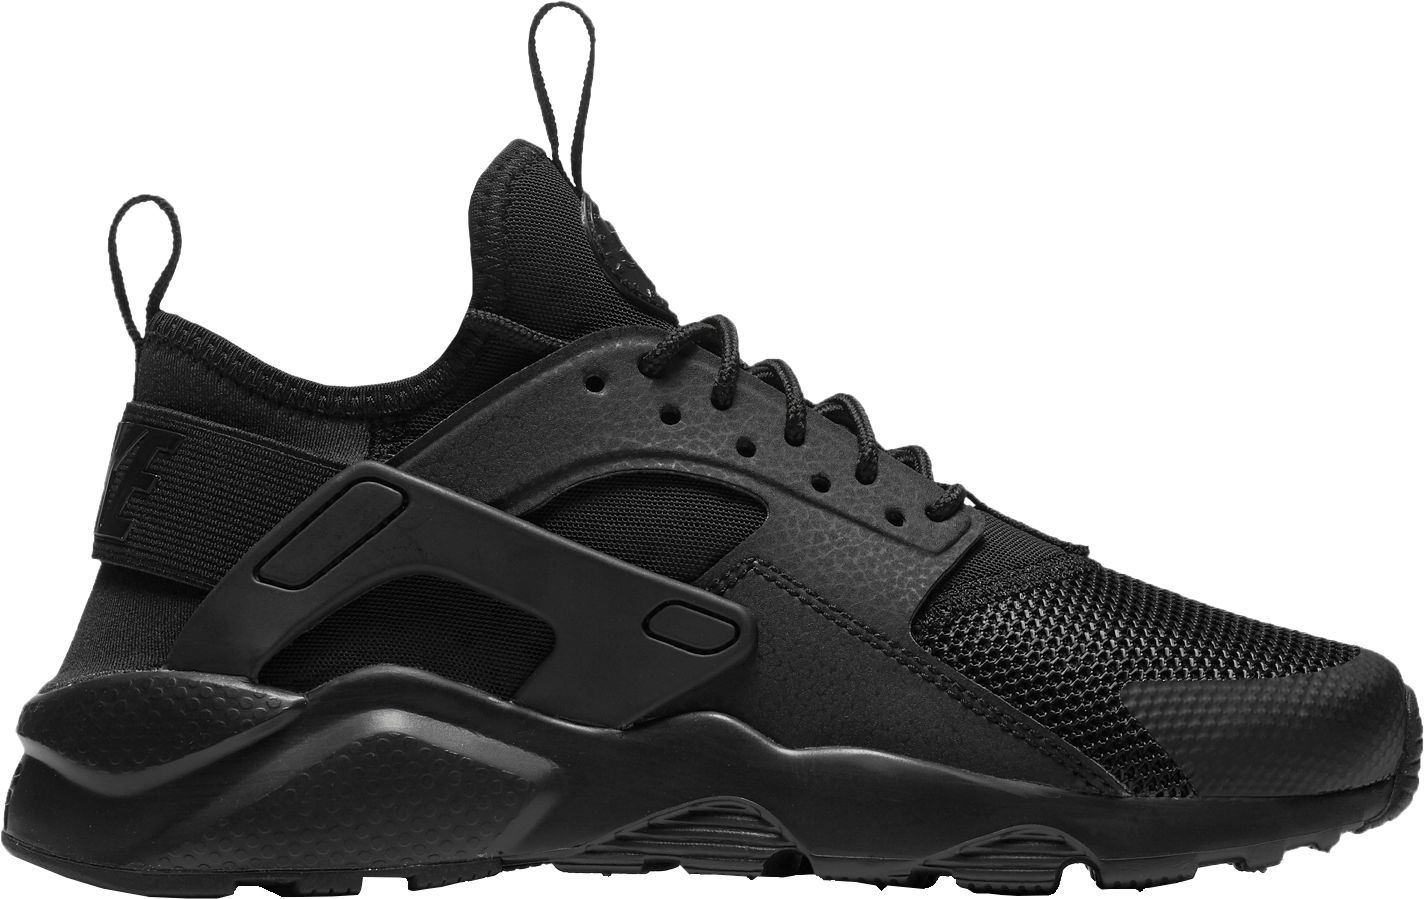 4c2fb66530 Nike Kids' Grade School Huarache Run Ultra Shoes, Boy's, Size: 3.5, Black